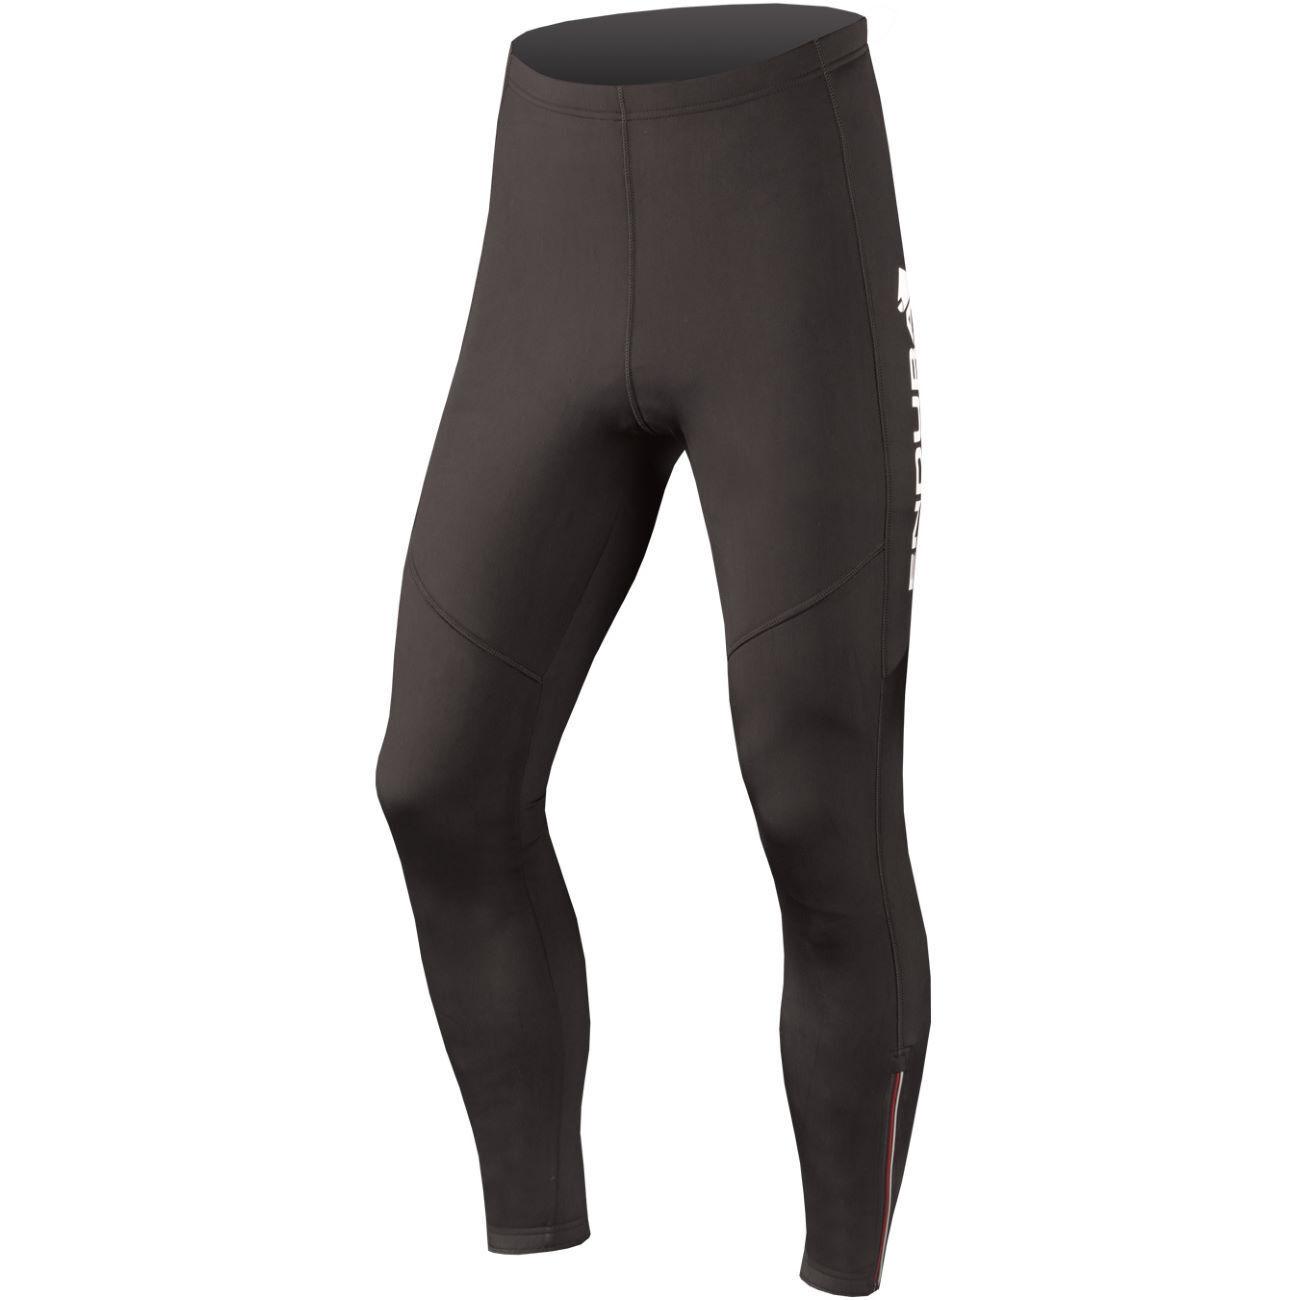 Endura Para Hombre Negra Thermolite Calzas sin Pad X-Large Ciclismo ejecutar Calzas Nuevo